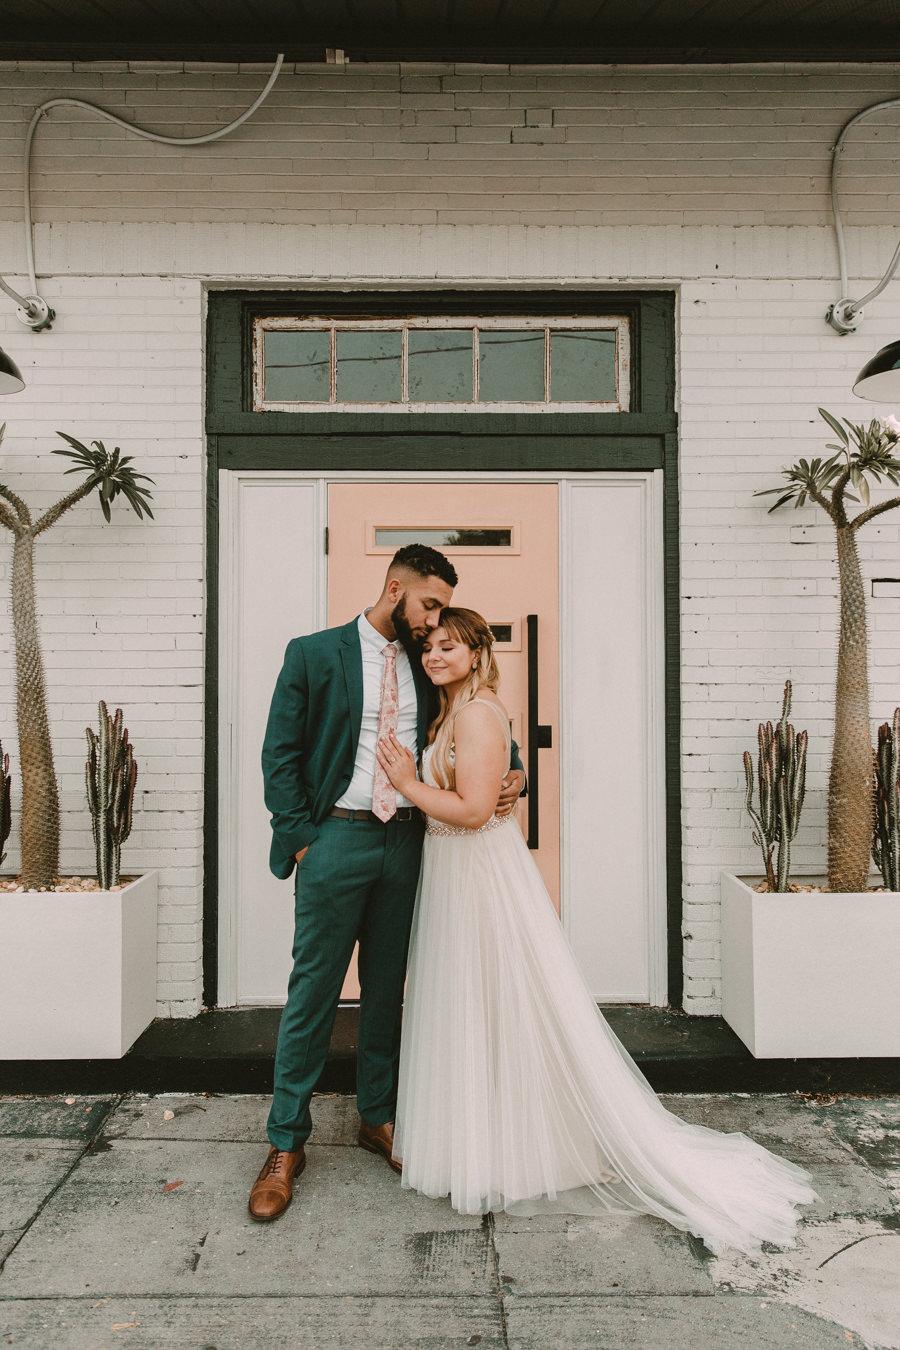 VeronicaandGarrett's Industrial Cavu Tampa Heights Wedding BHLDN gown Salt Block Hospitality Fancy Free Nursery Foundation Coffee-240.jpg